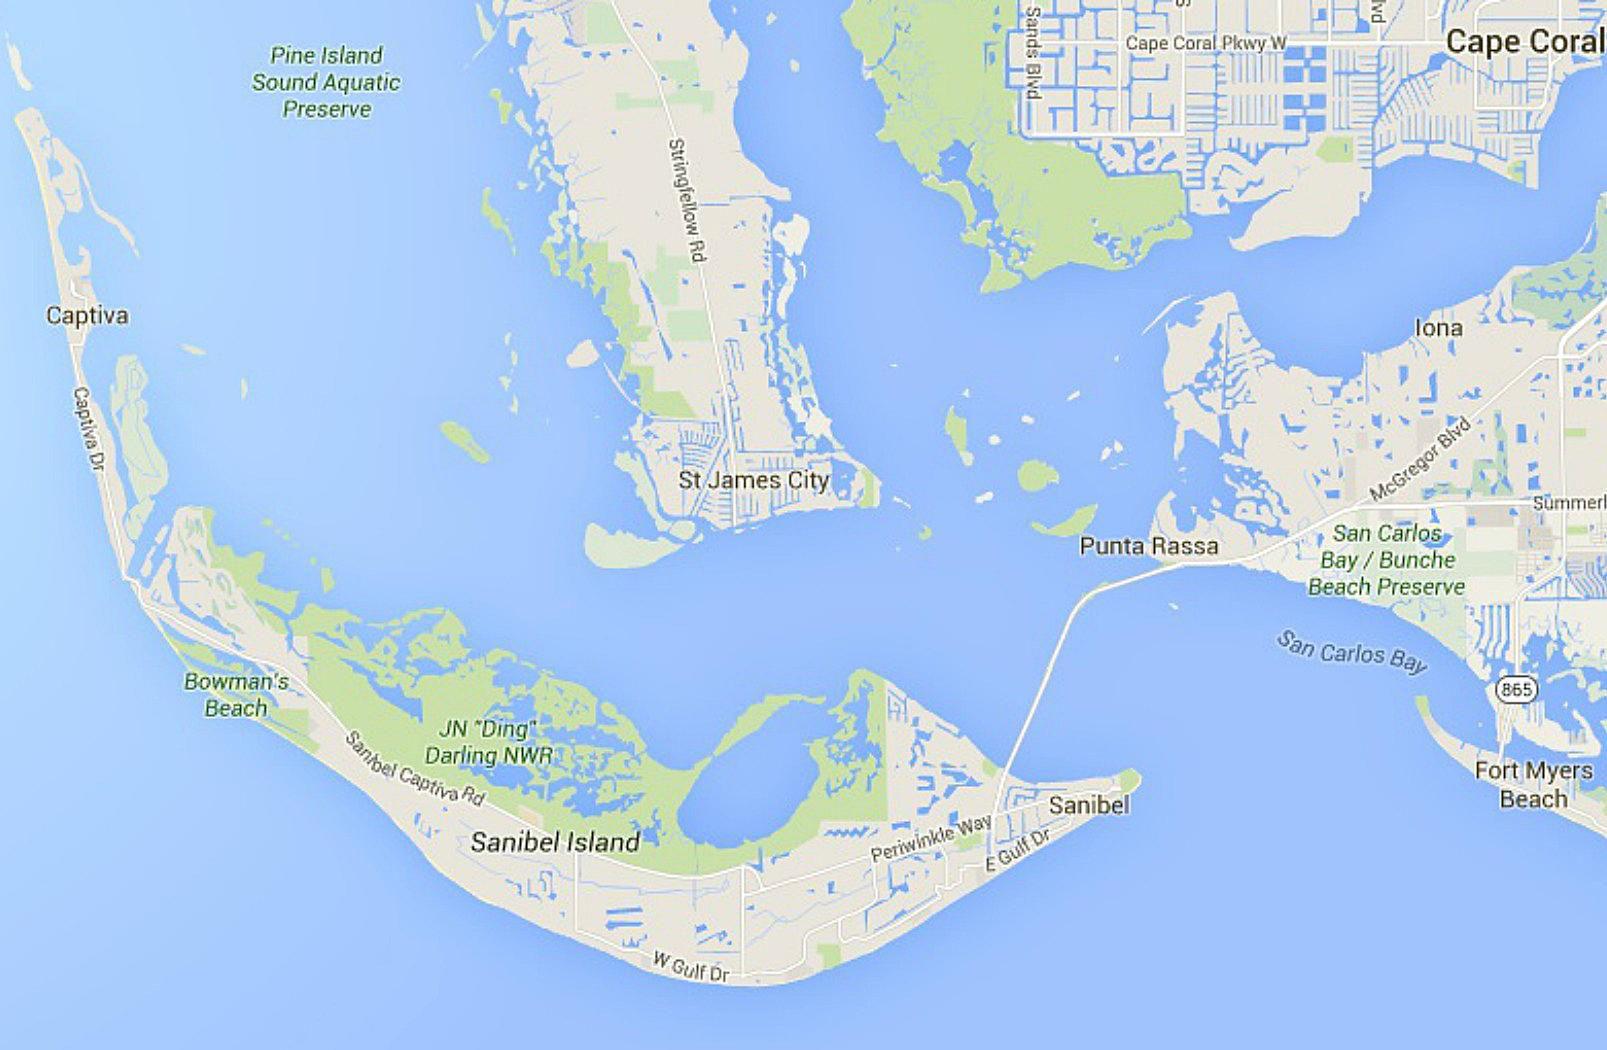 Maps Of Florida: Orlando, Tampa, Miami, Keys, And More - Florida Keys Map Of Beaches